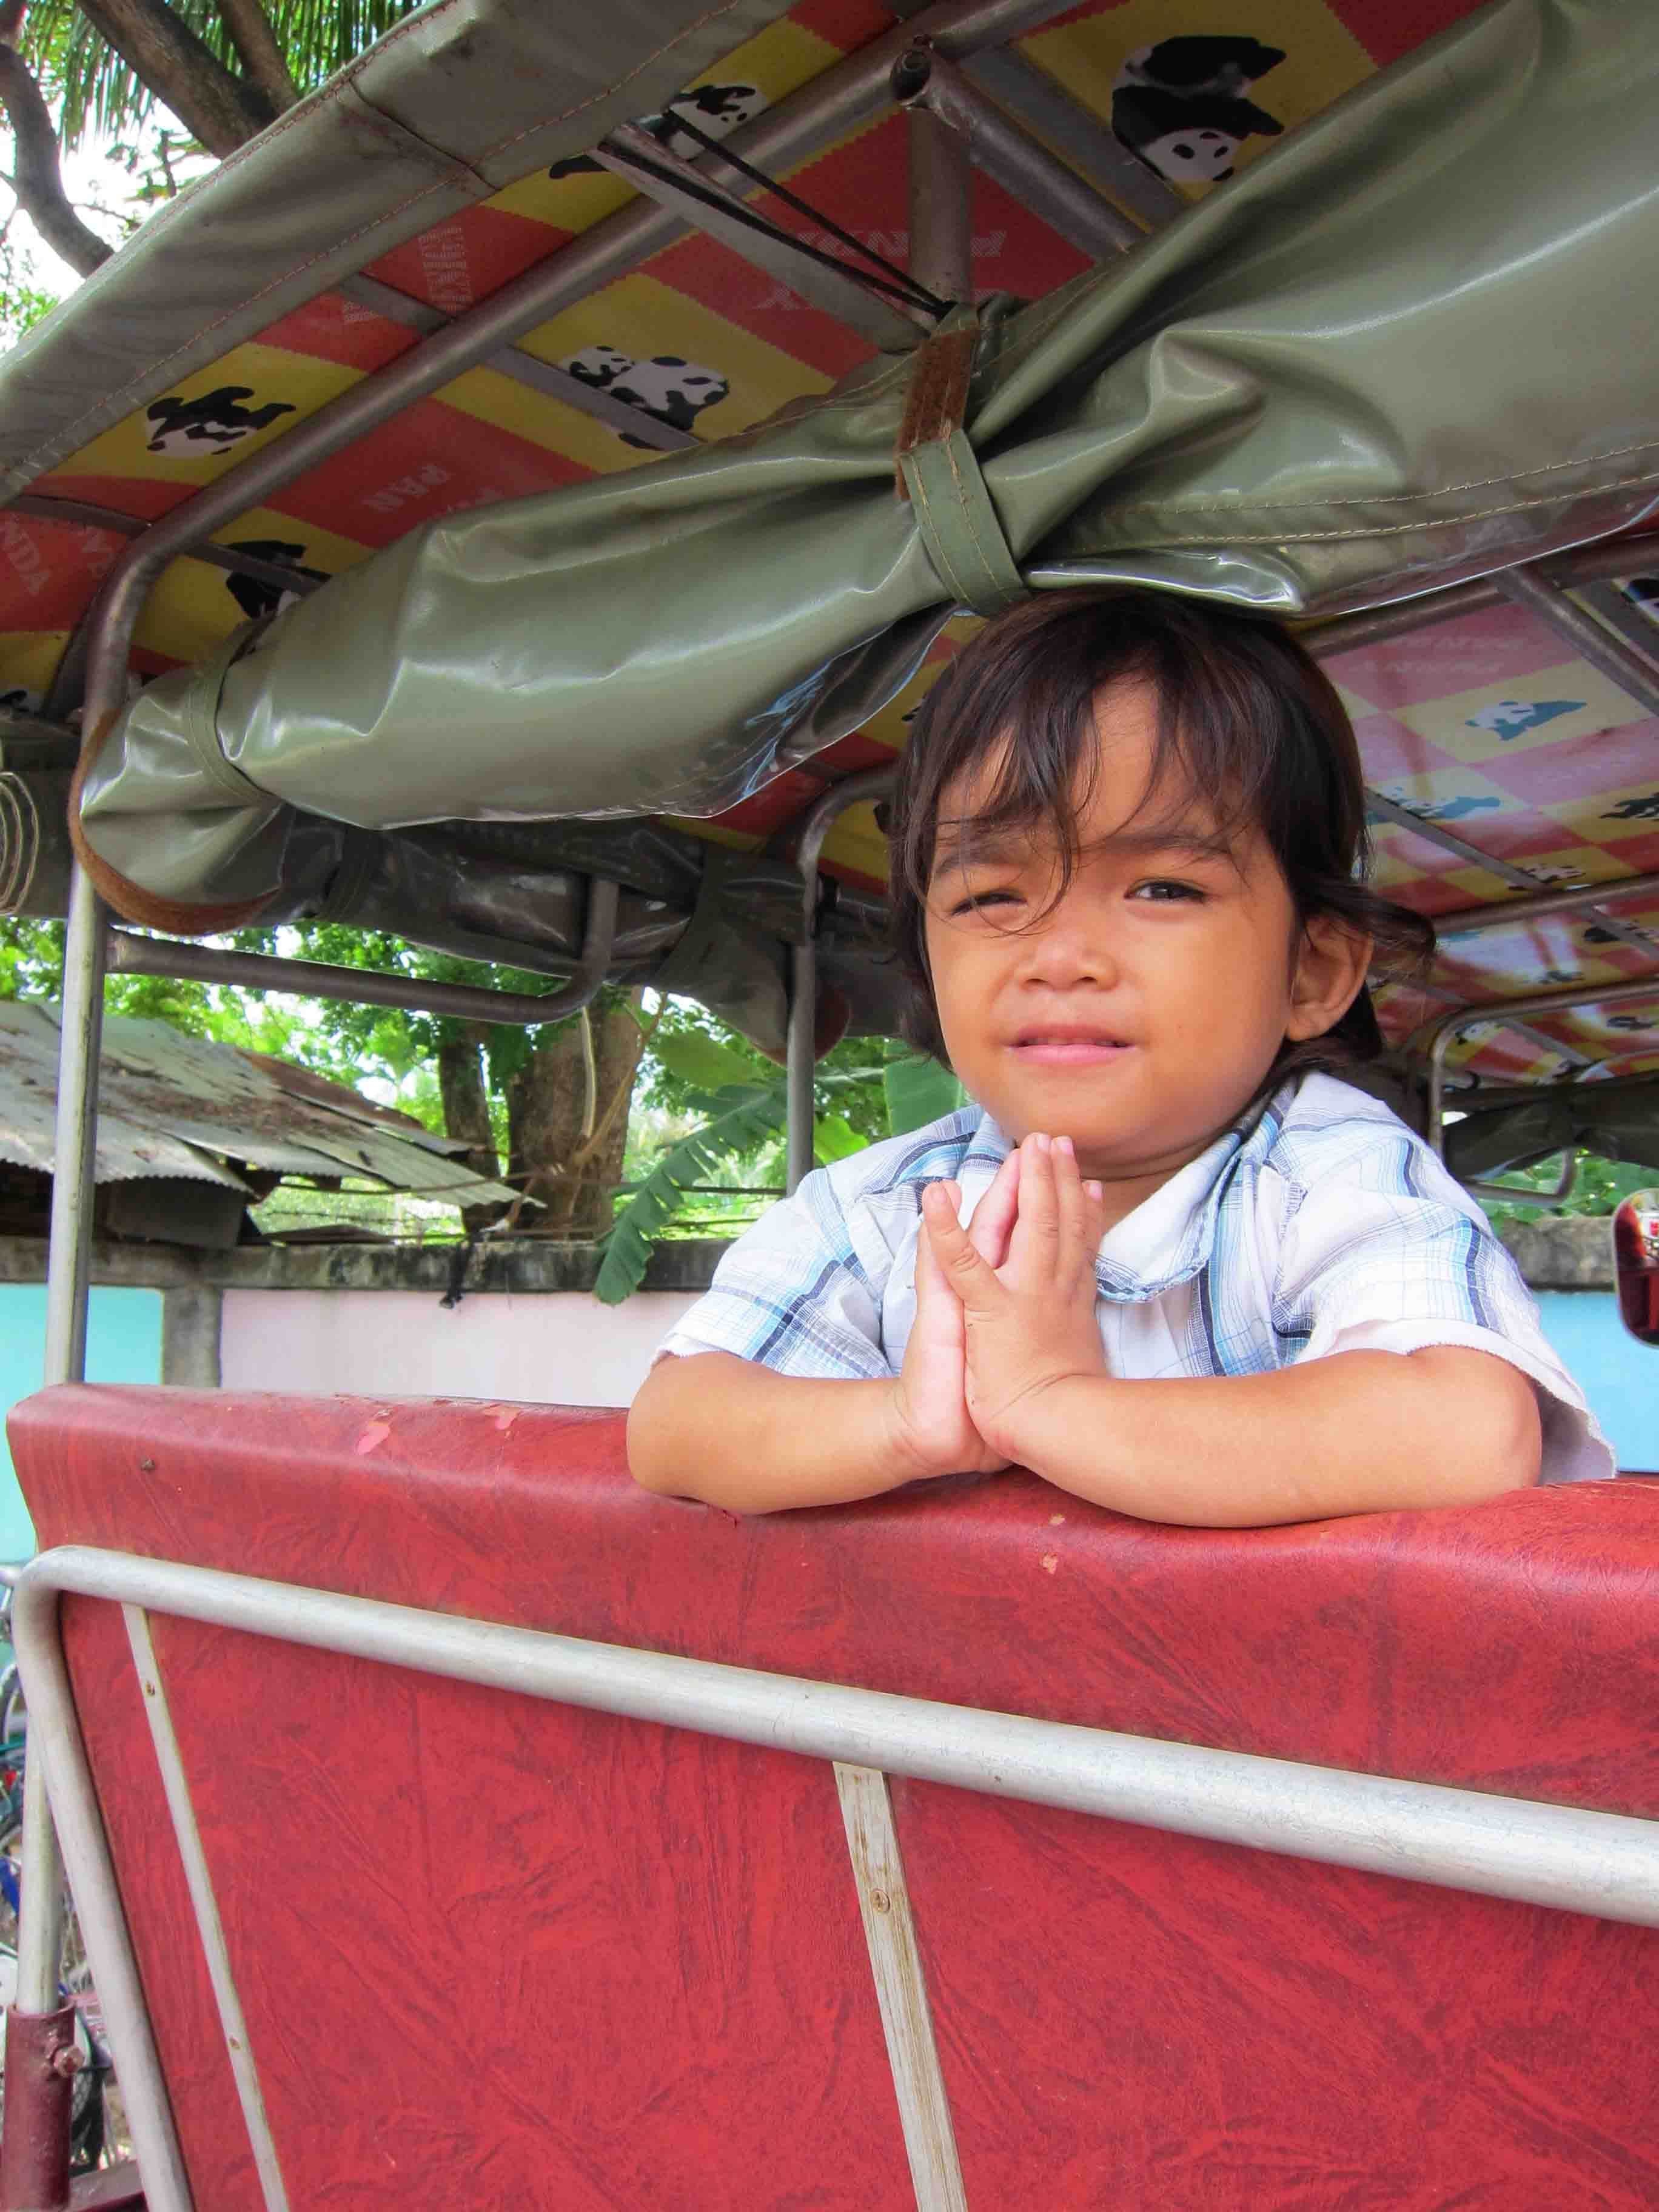 Cambodian girlschildren sex